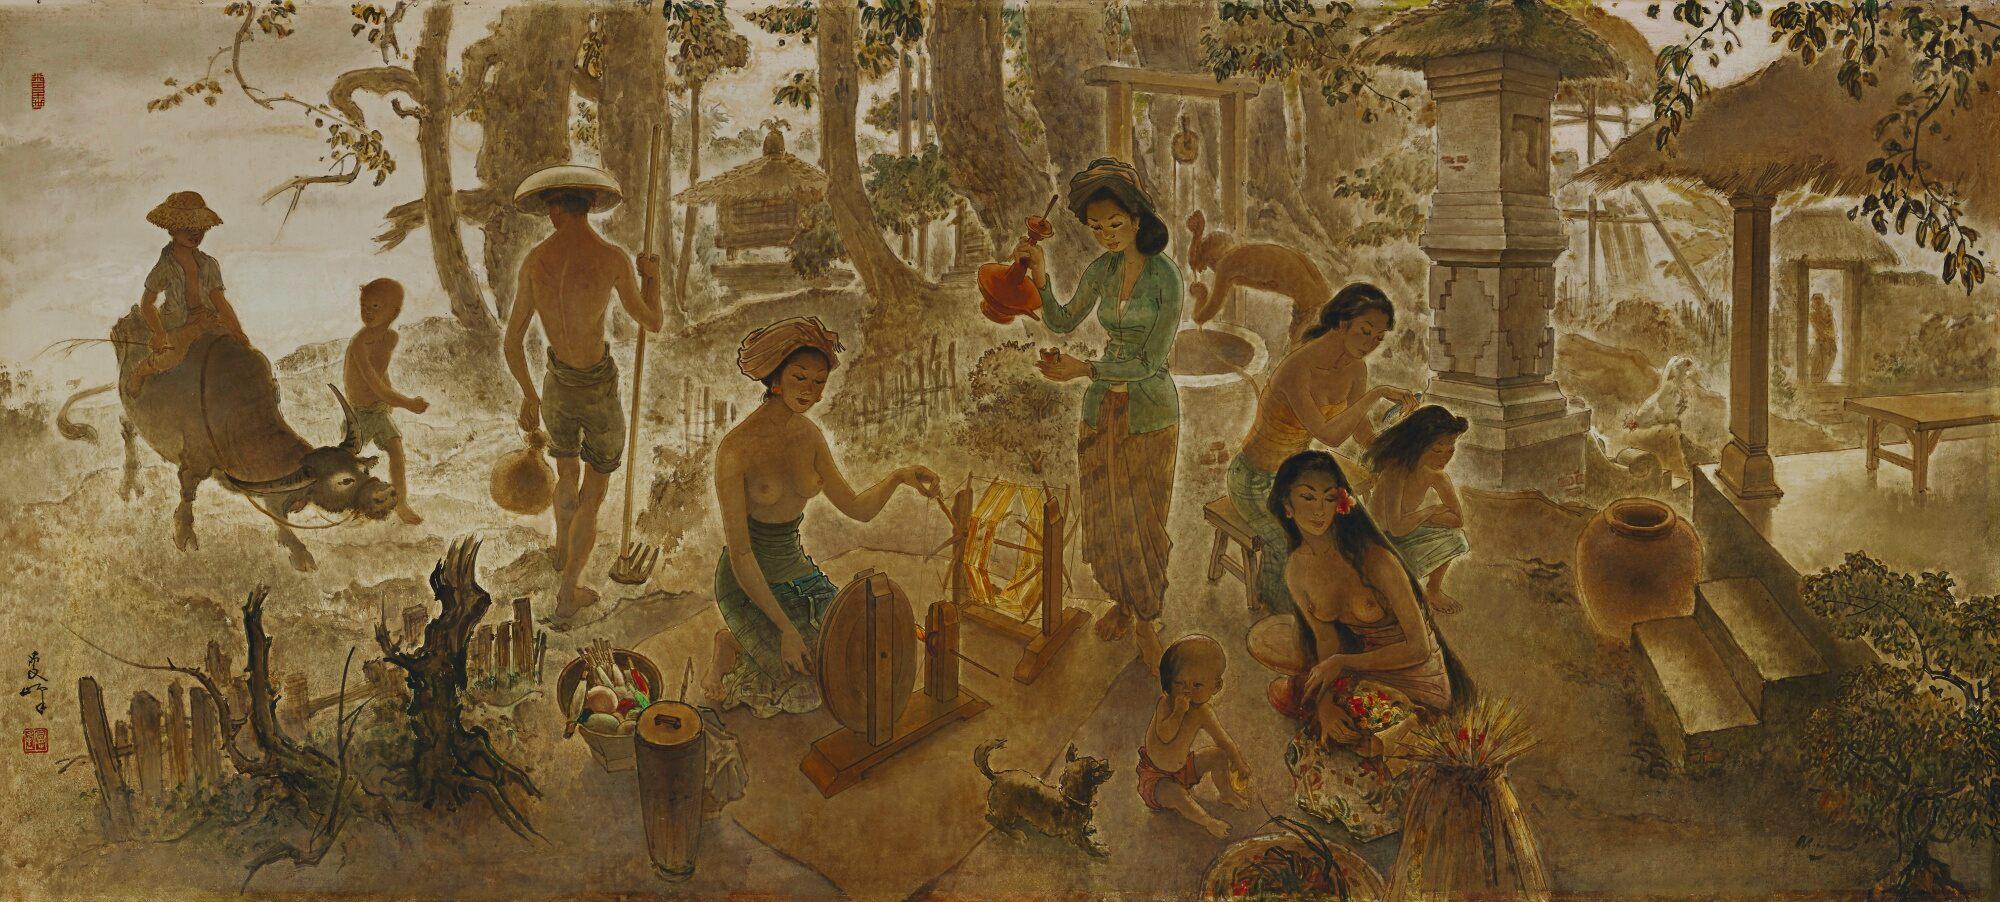 Tác phẩm Bali Life. Ảnh: Sothebys.